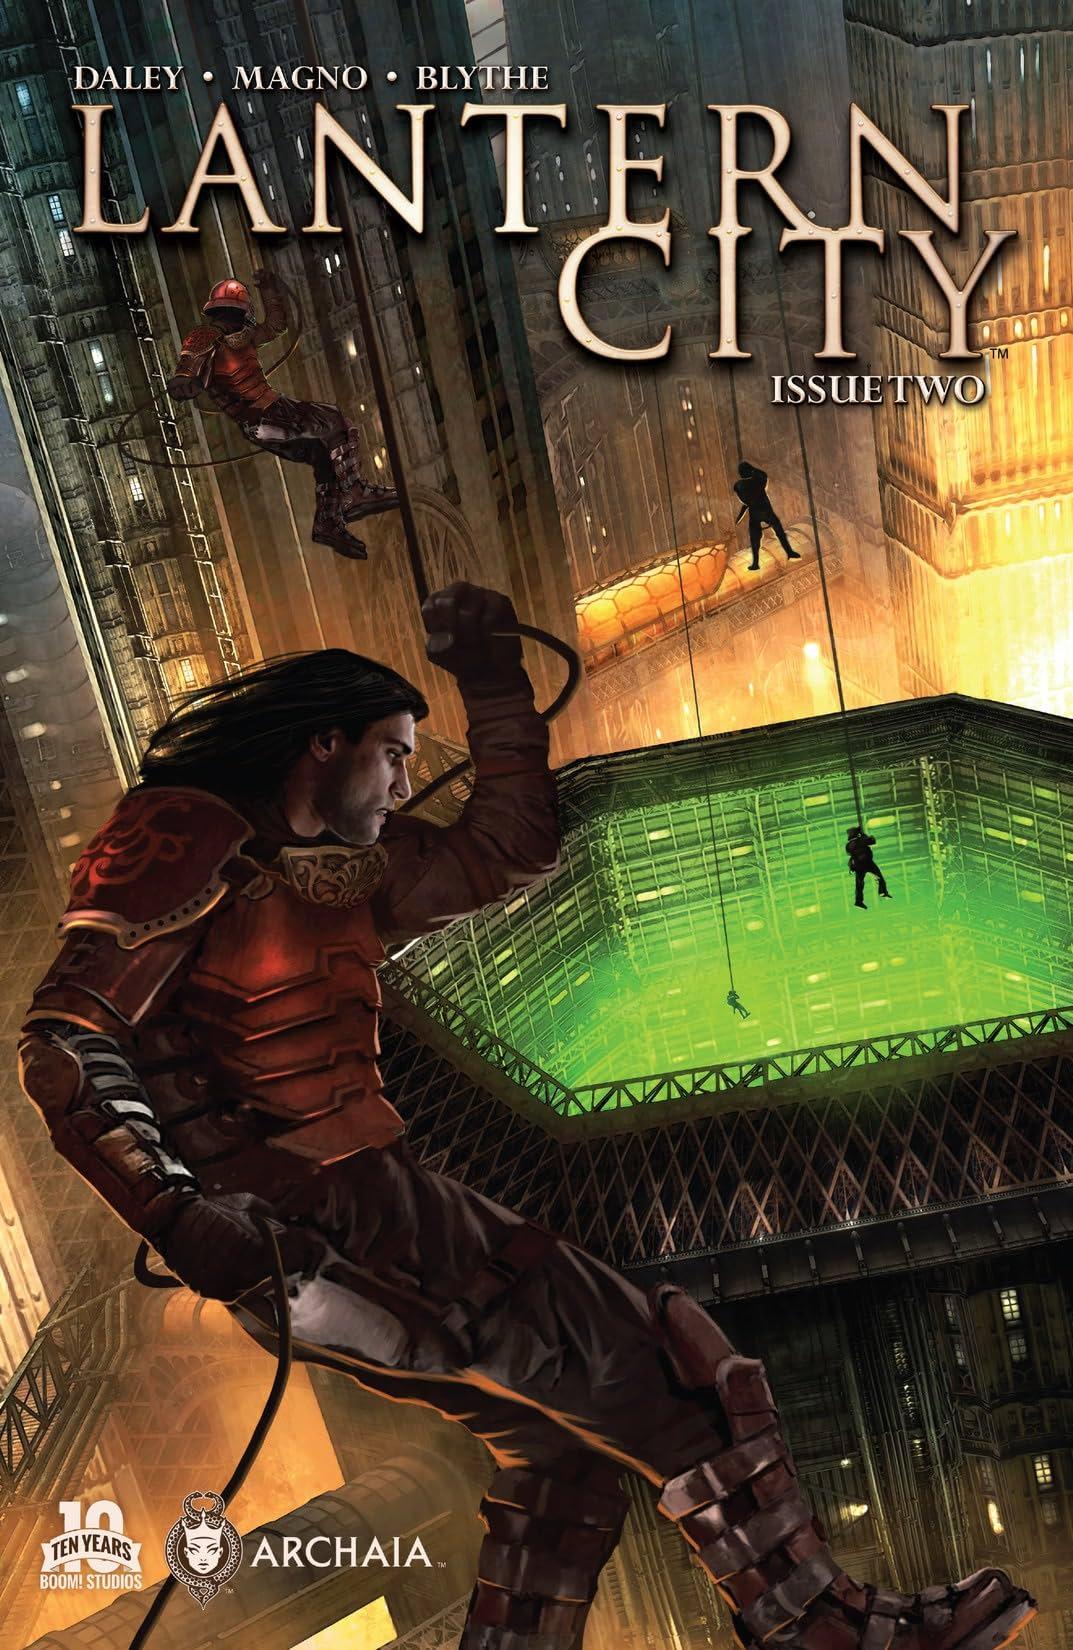 Lantern City #2